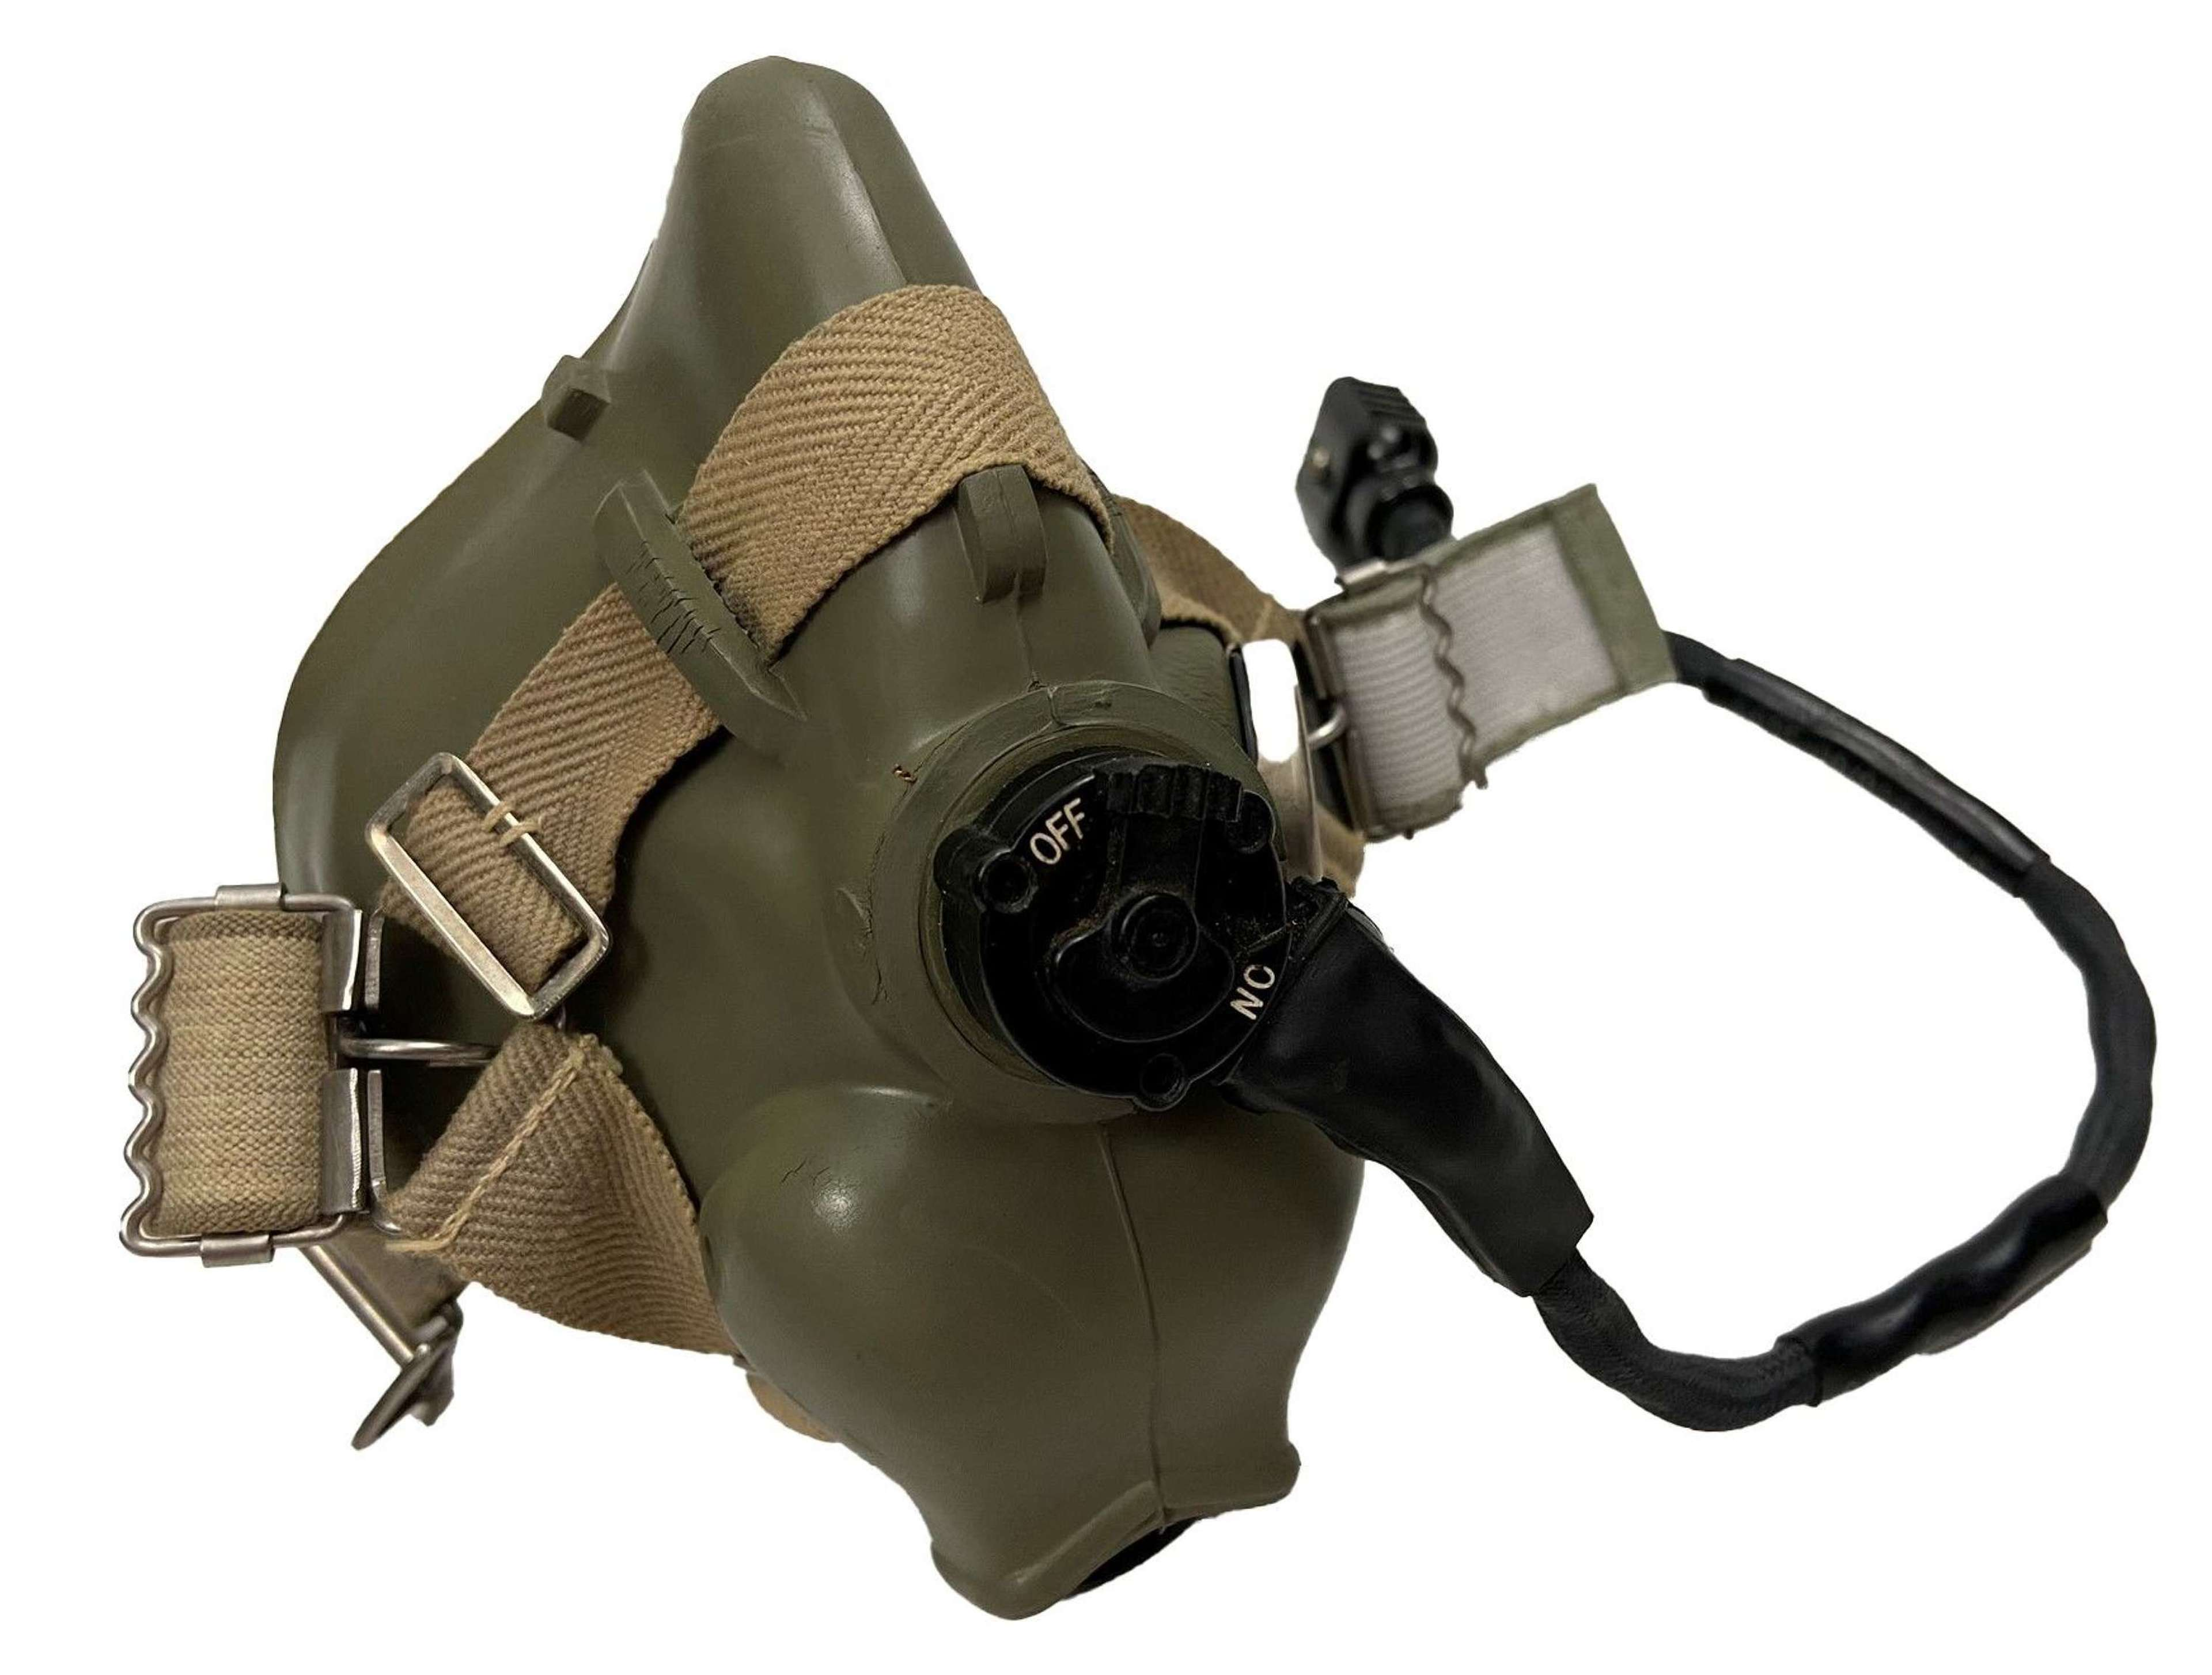 Original 1974 Dated RAF H Type Oxygen Mask - Size Medium